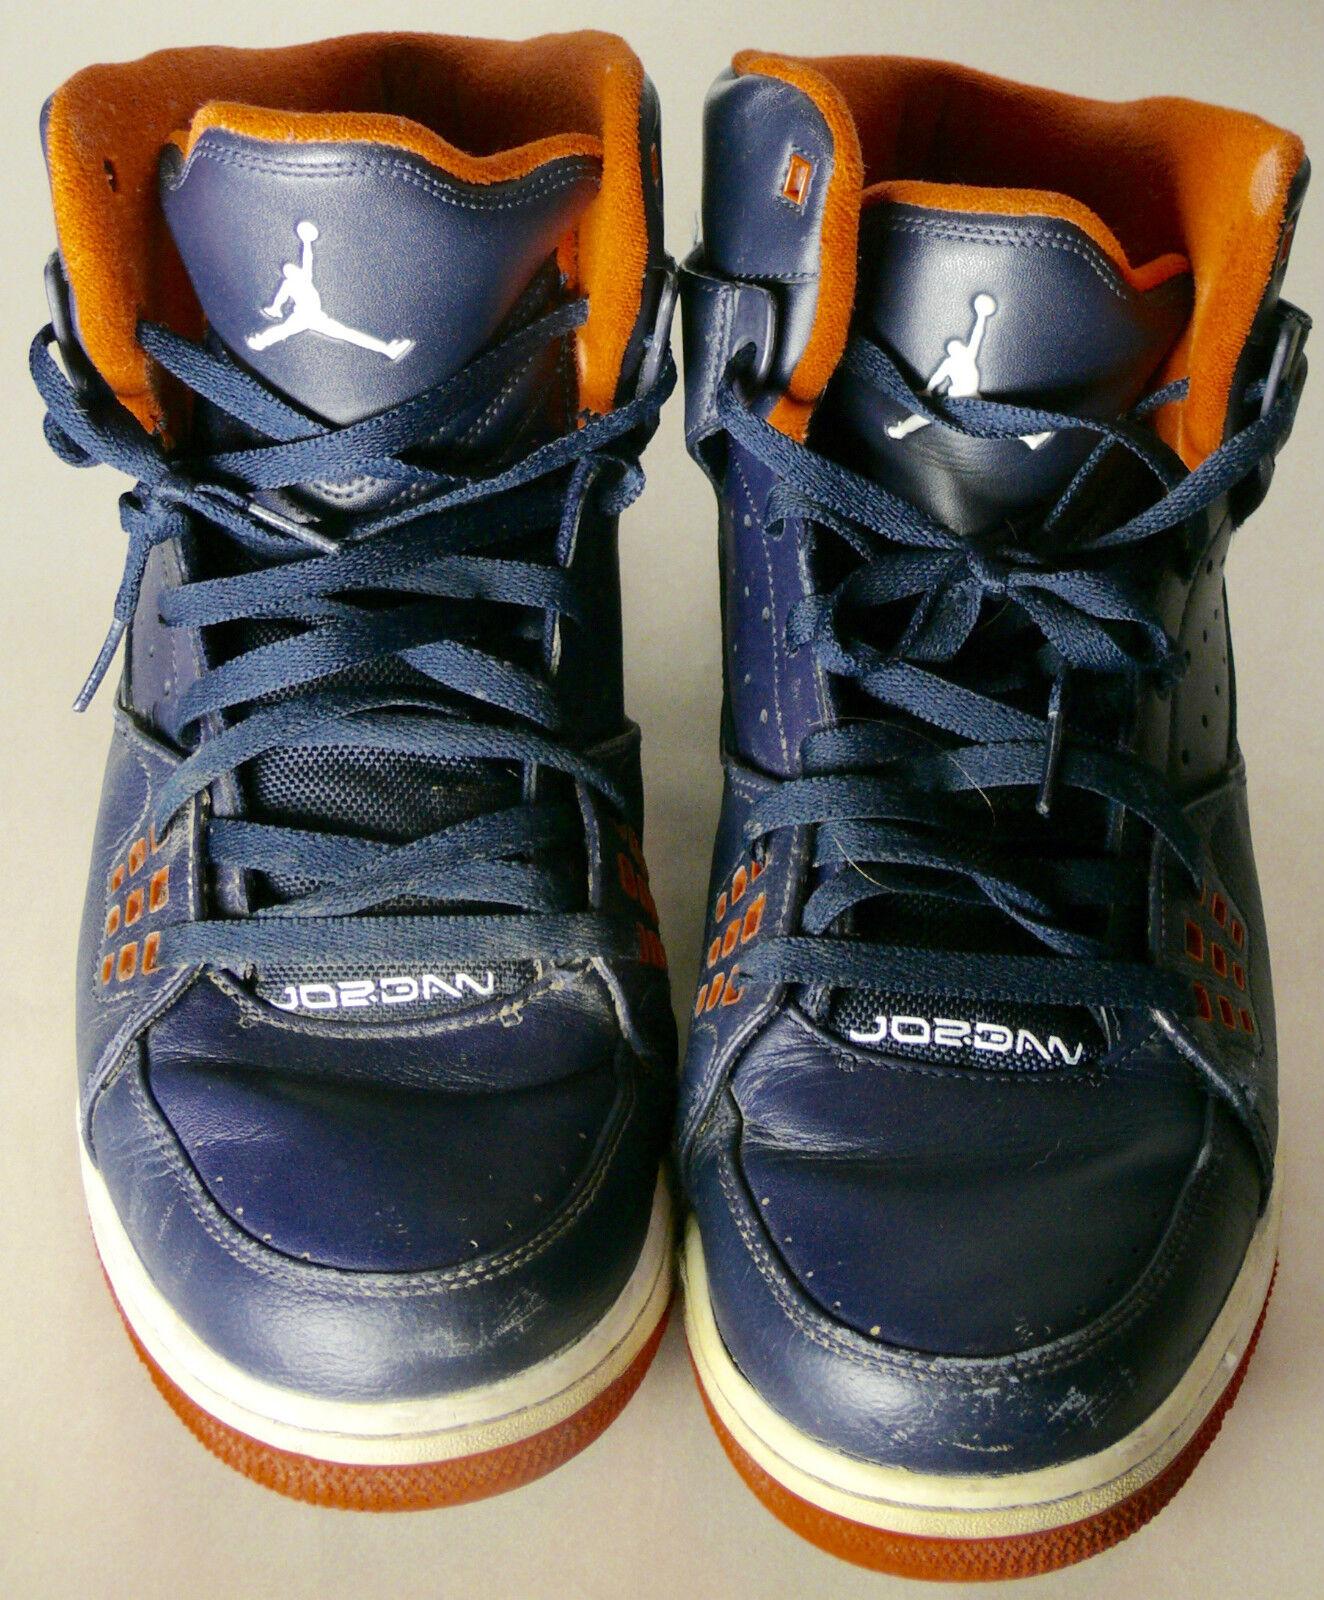 NIKE BASKETBALL SHOES AIR JORDAN SIZE 14 blueE AND orange